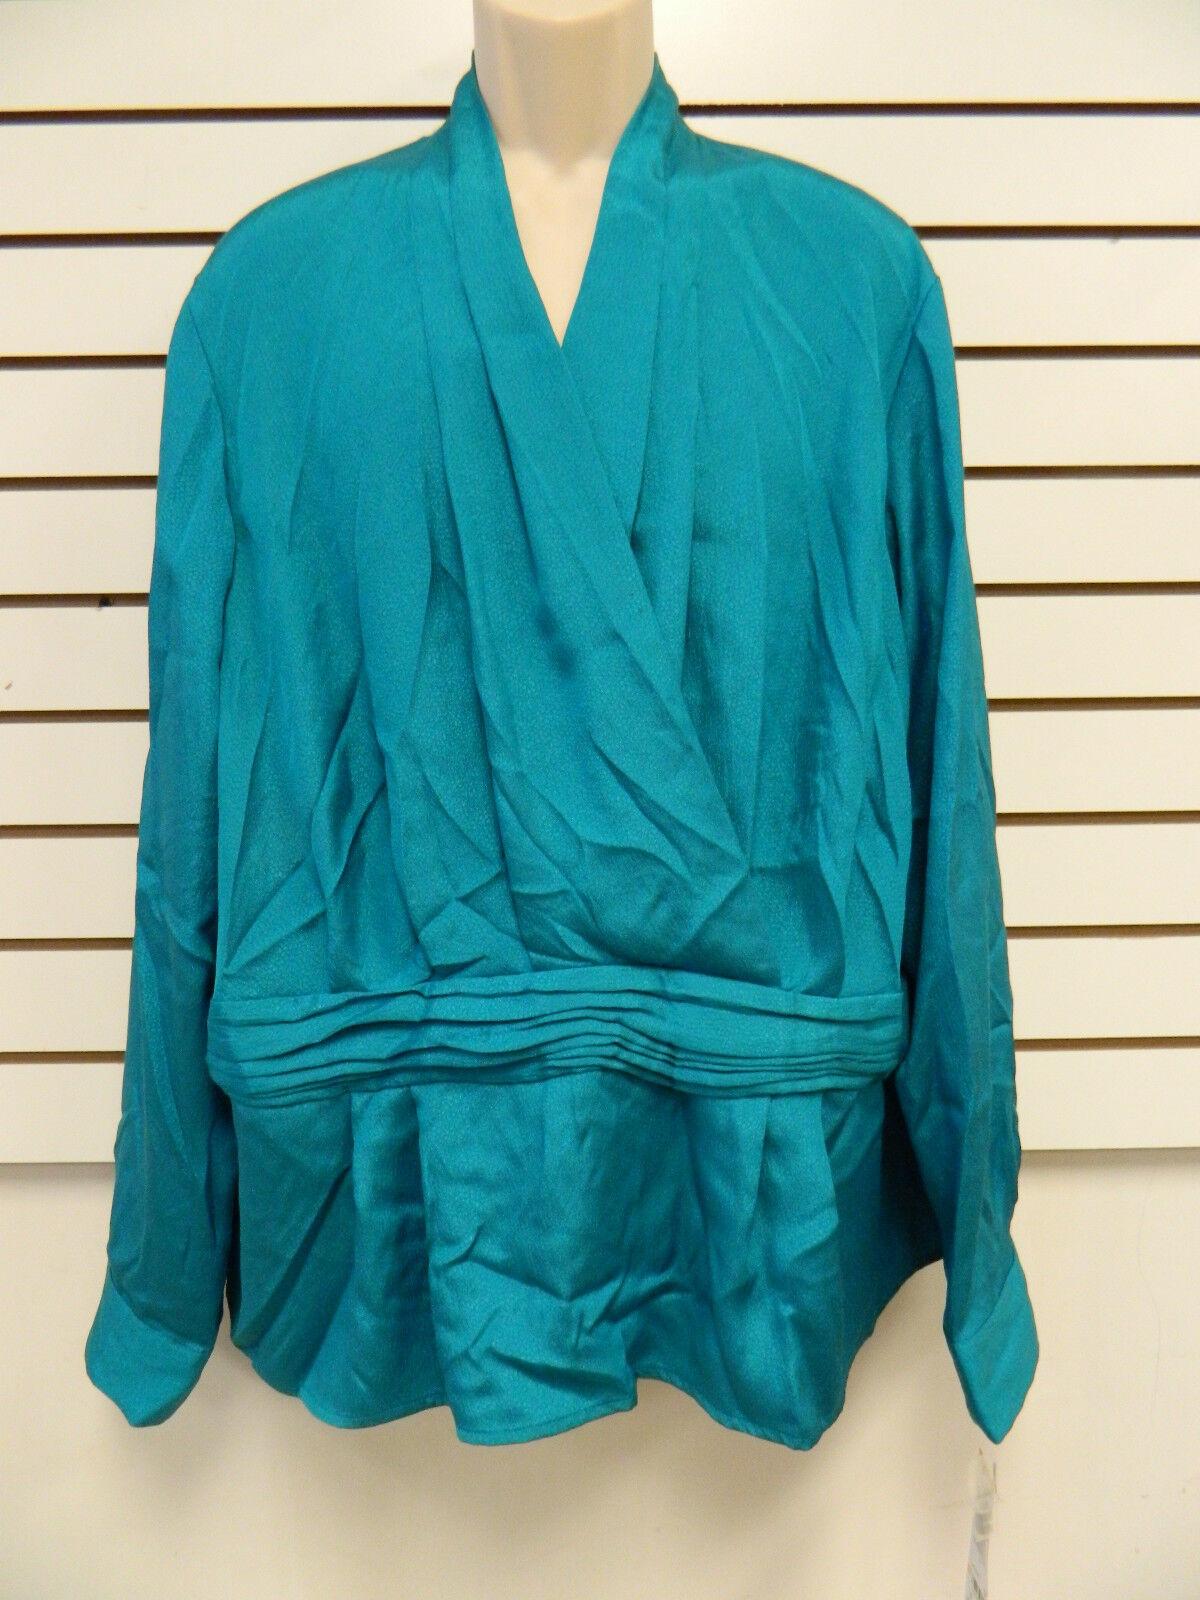 Jones New York Collection Woman New Womens Jade Blouse 24W Shirt